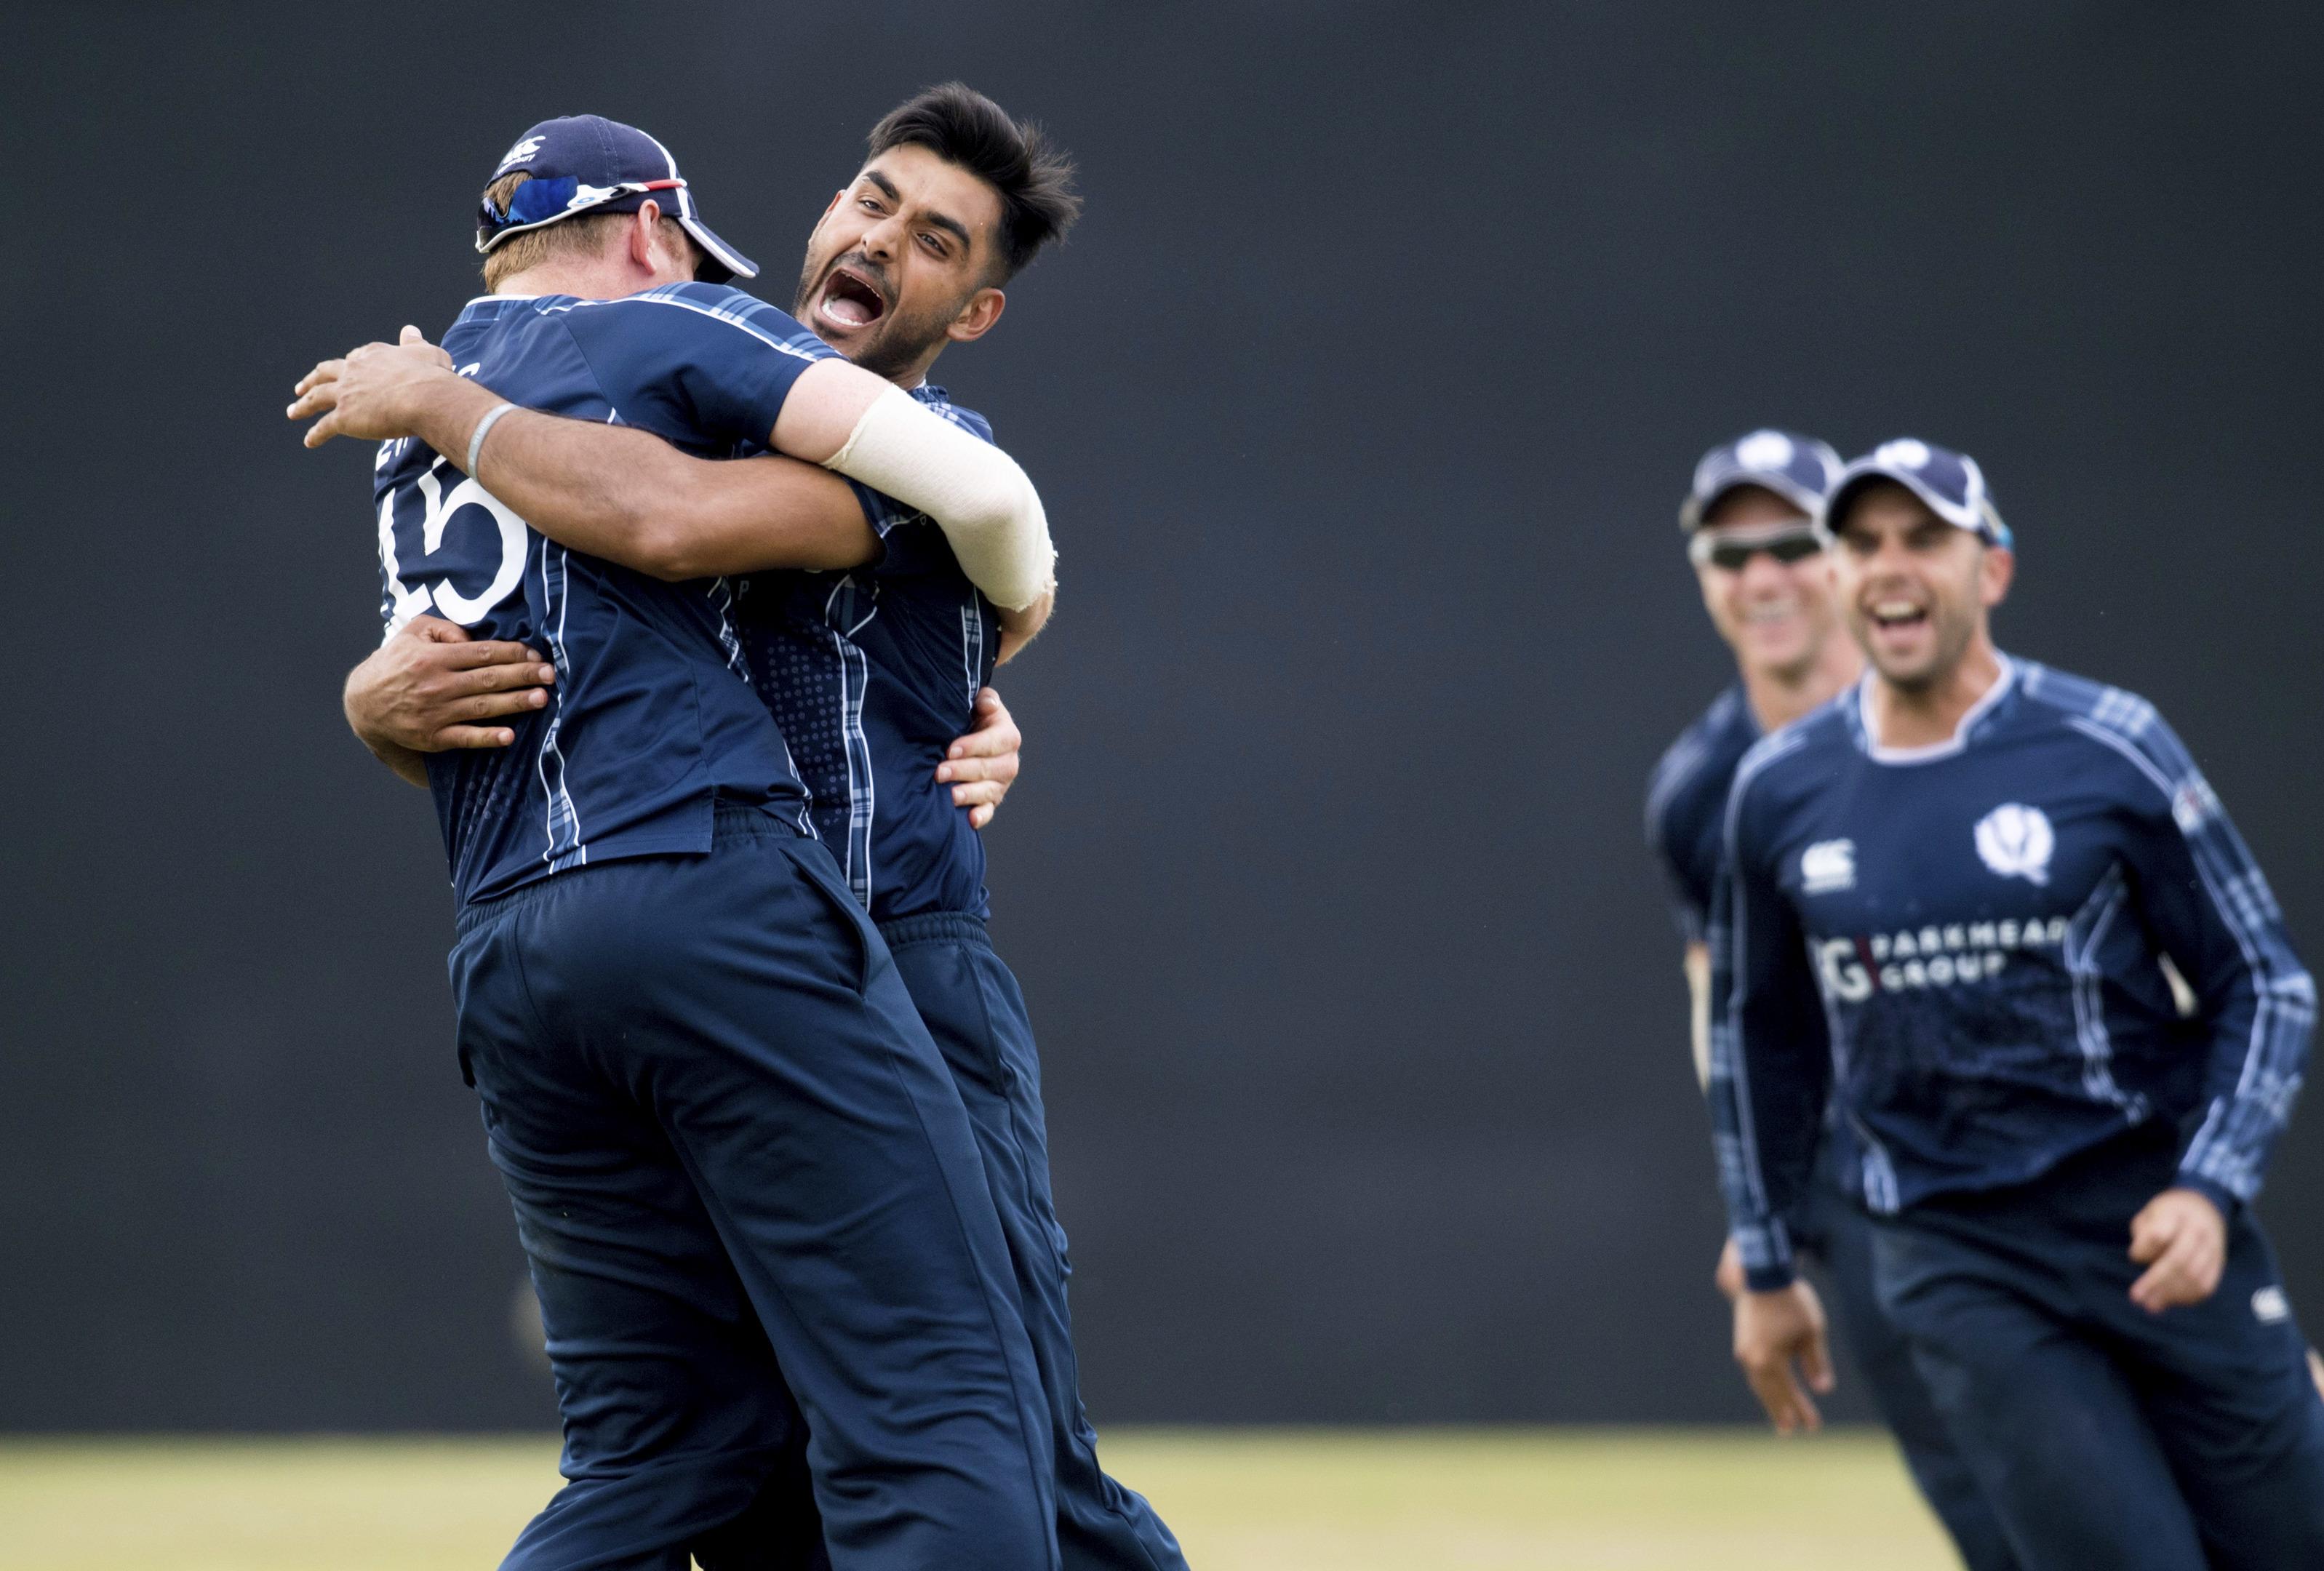 Scotland's Safyaan Sharif celebrates as Scotland win by six runs at The Grange in Edinburgh